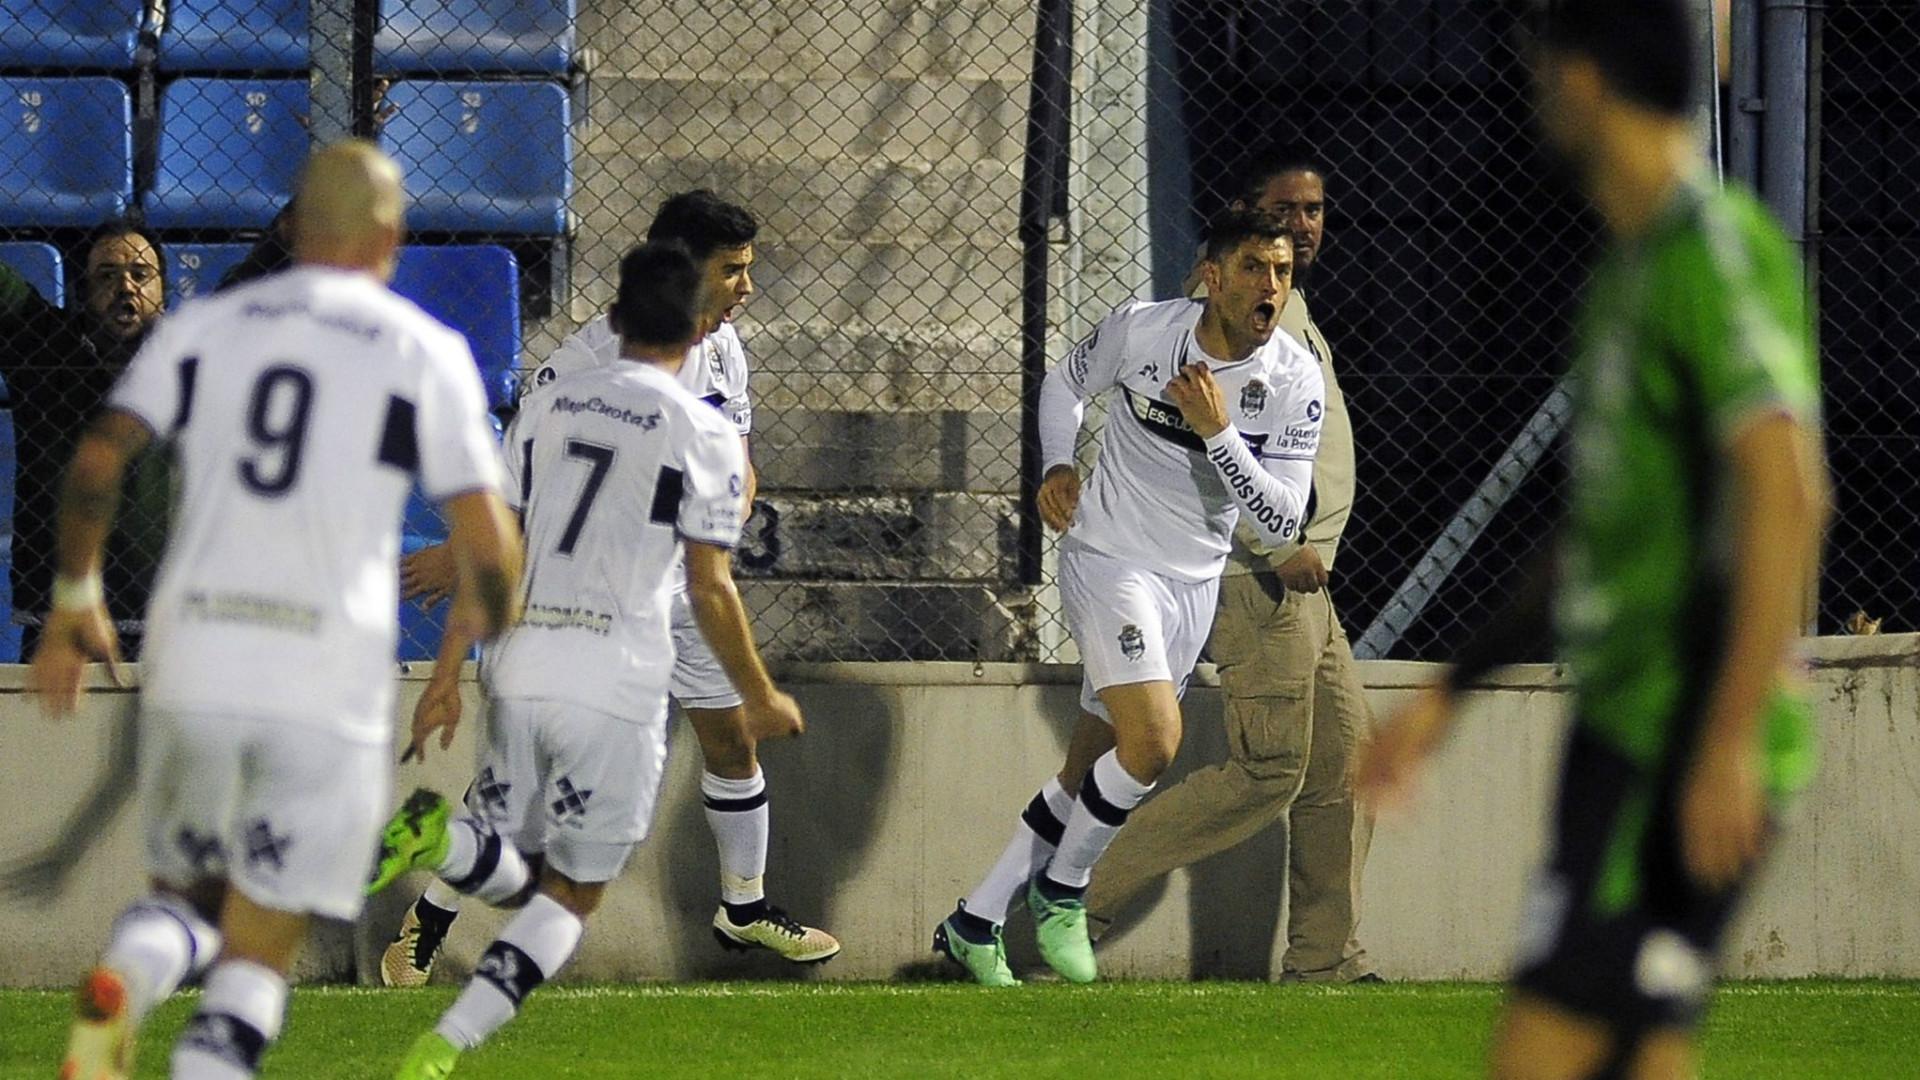 Gimnasia Sportivo Belgrano 32avos de final Copa Argentina